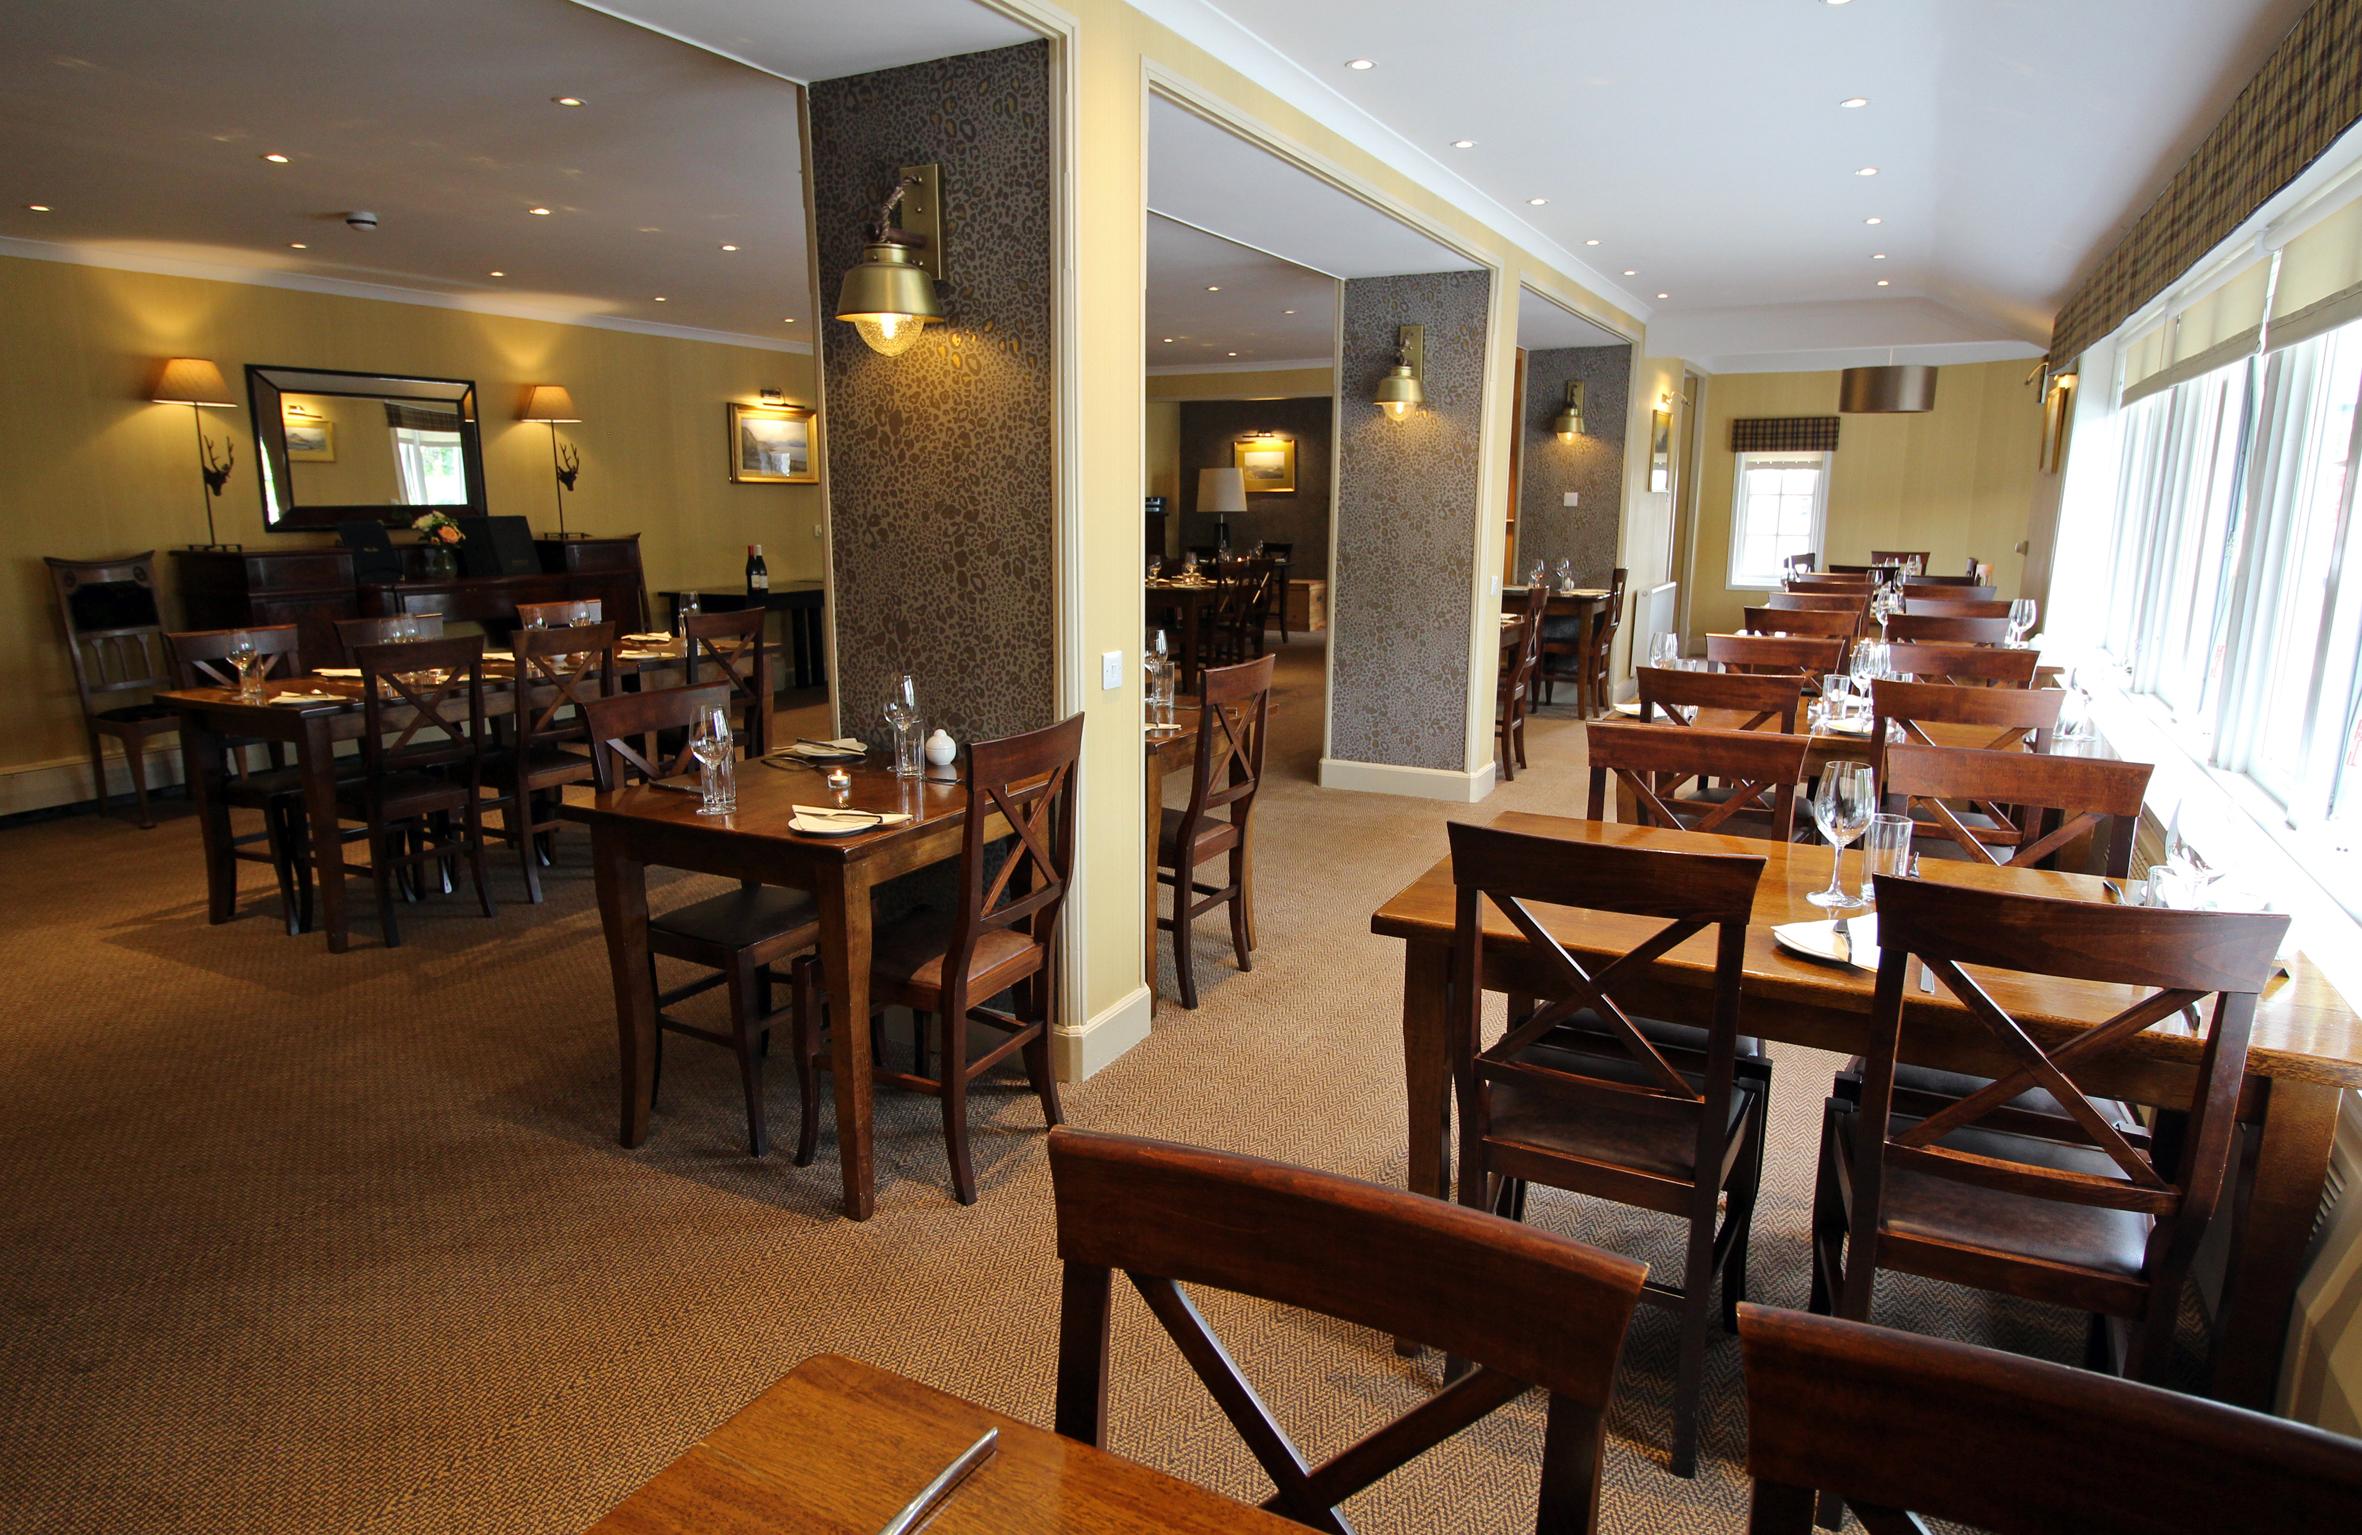 HartaRestaurant3.jpg